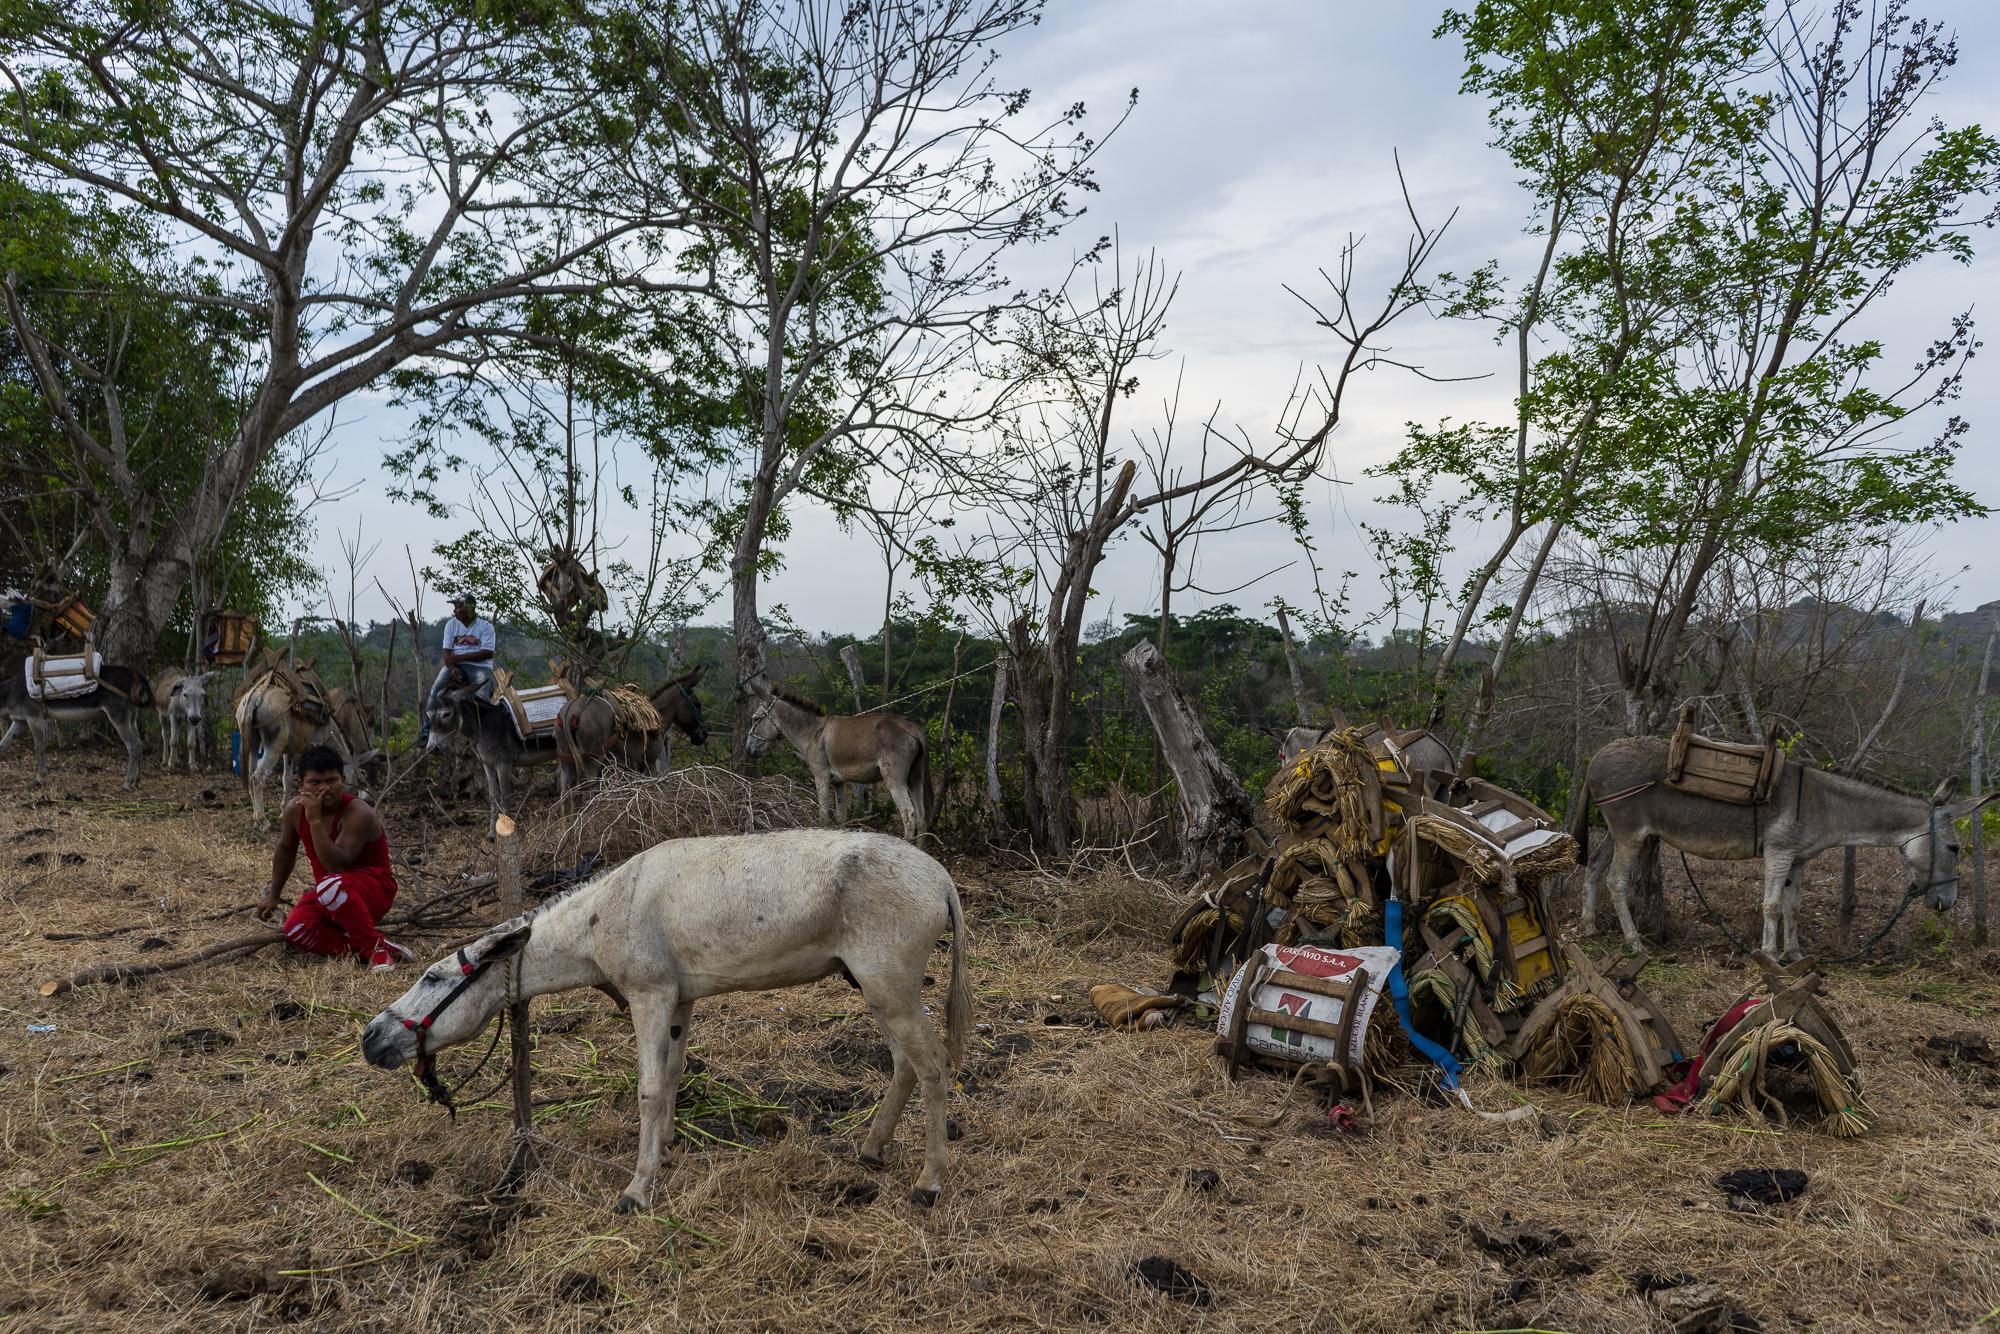 burro project-25.jpg